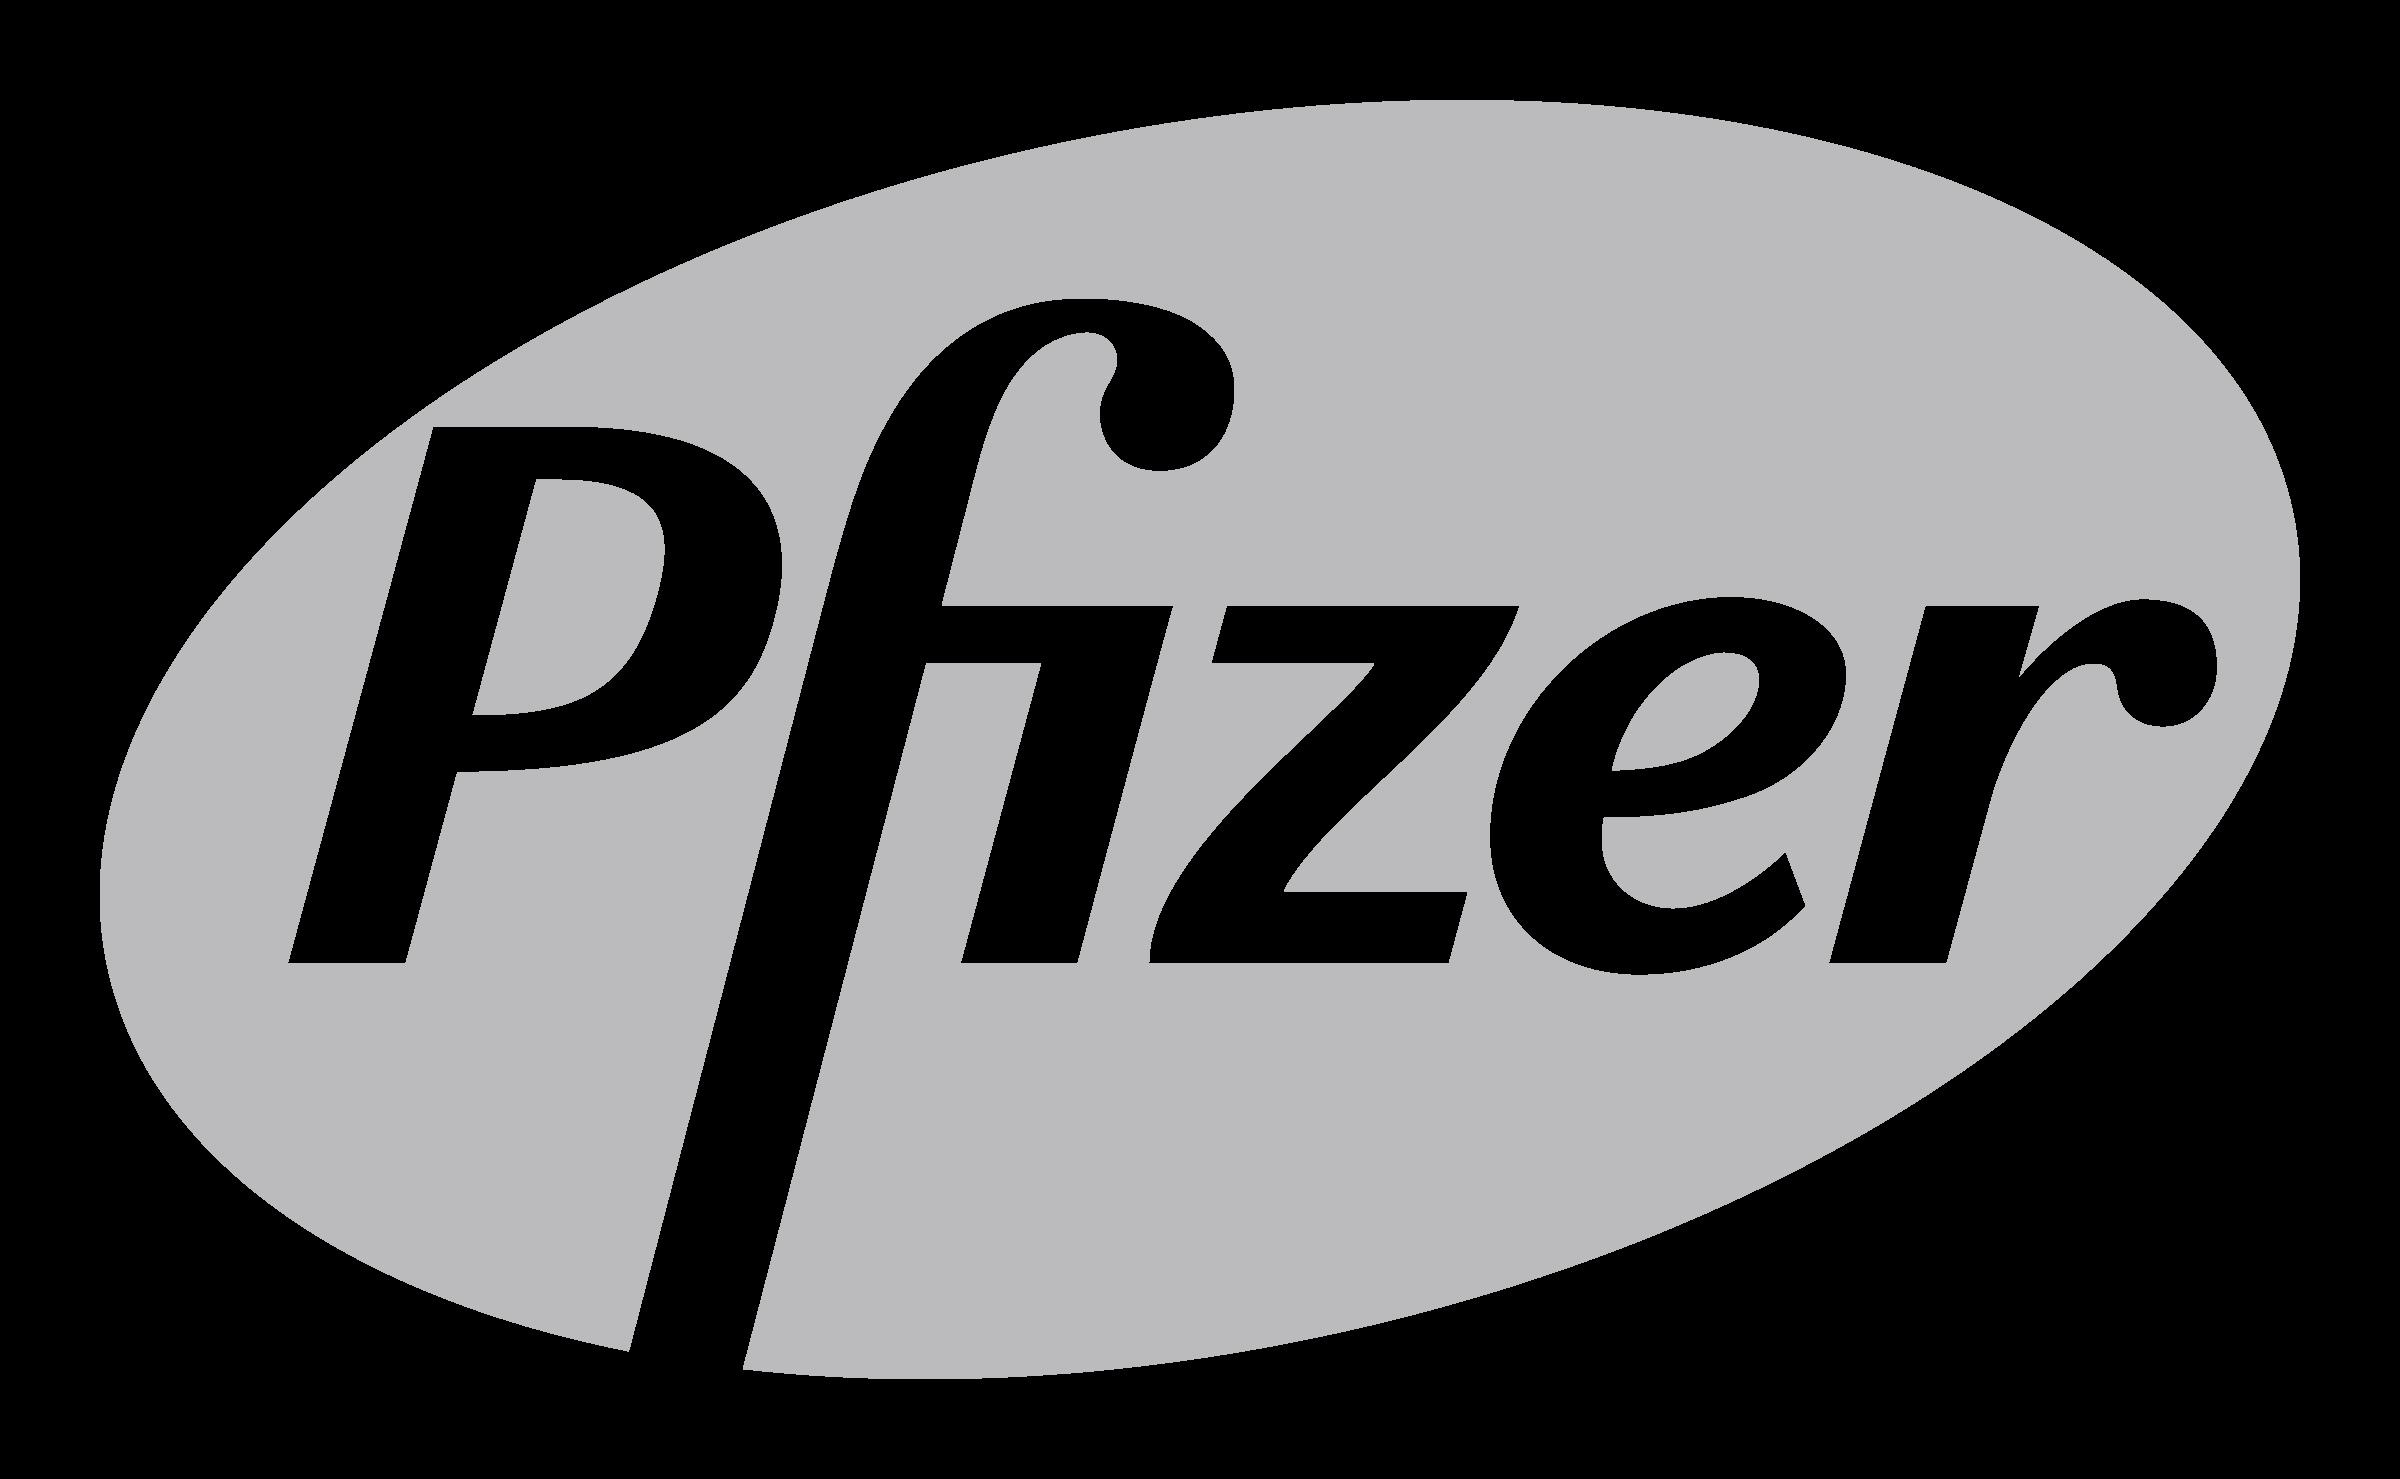 Pfizer G